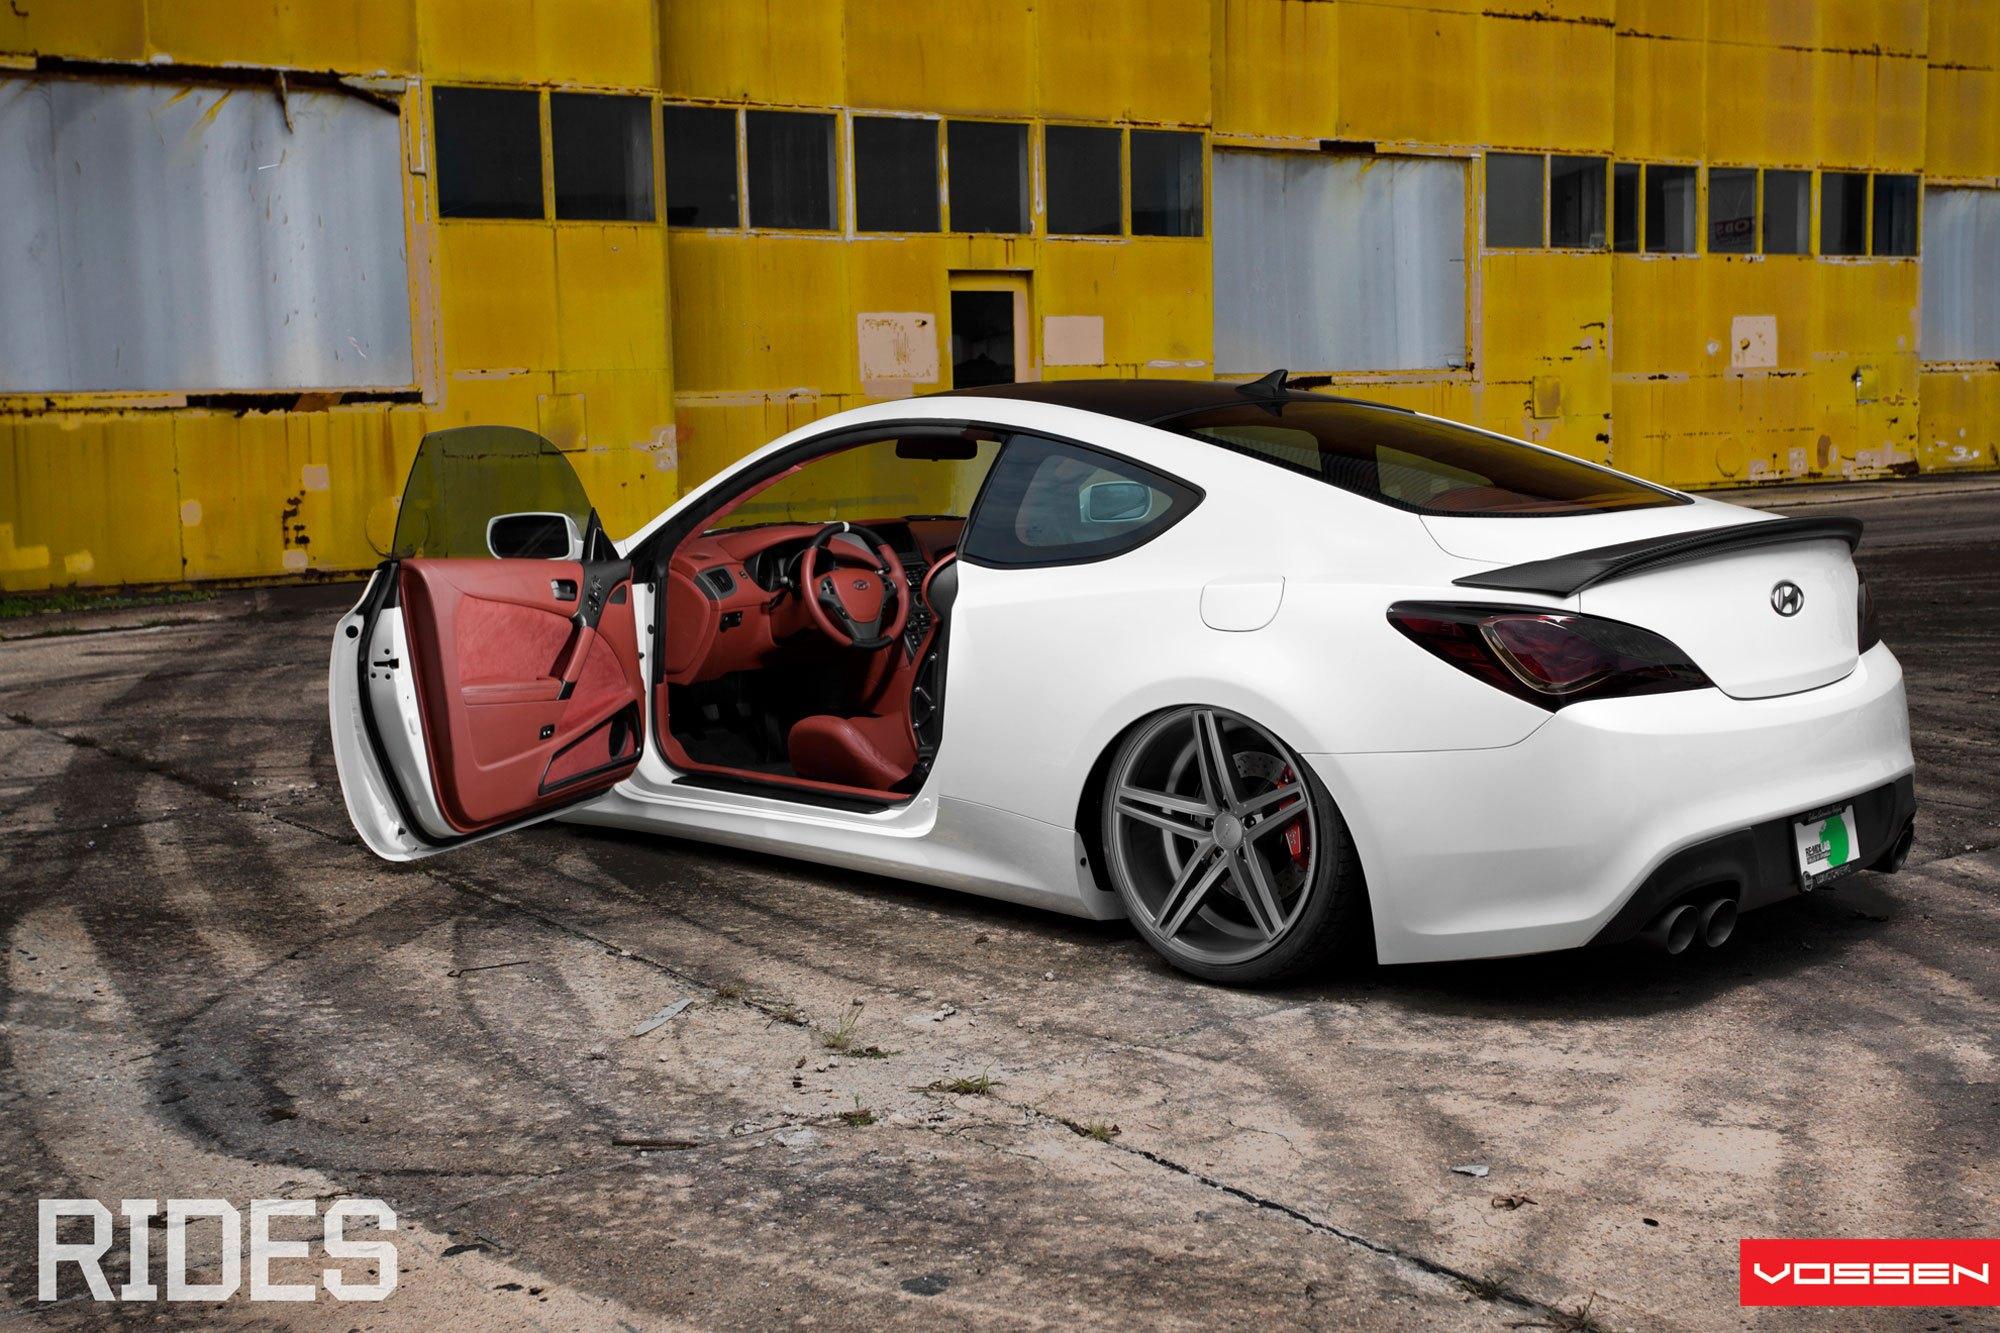 Aftermarket Interior Kit In White Hyundai Genesis Coupe   Photo By Vossen